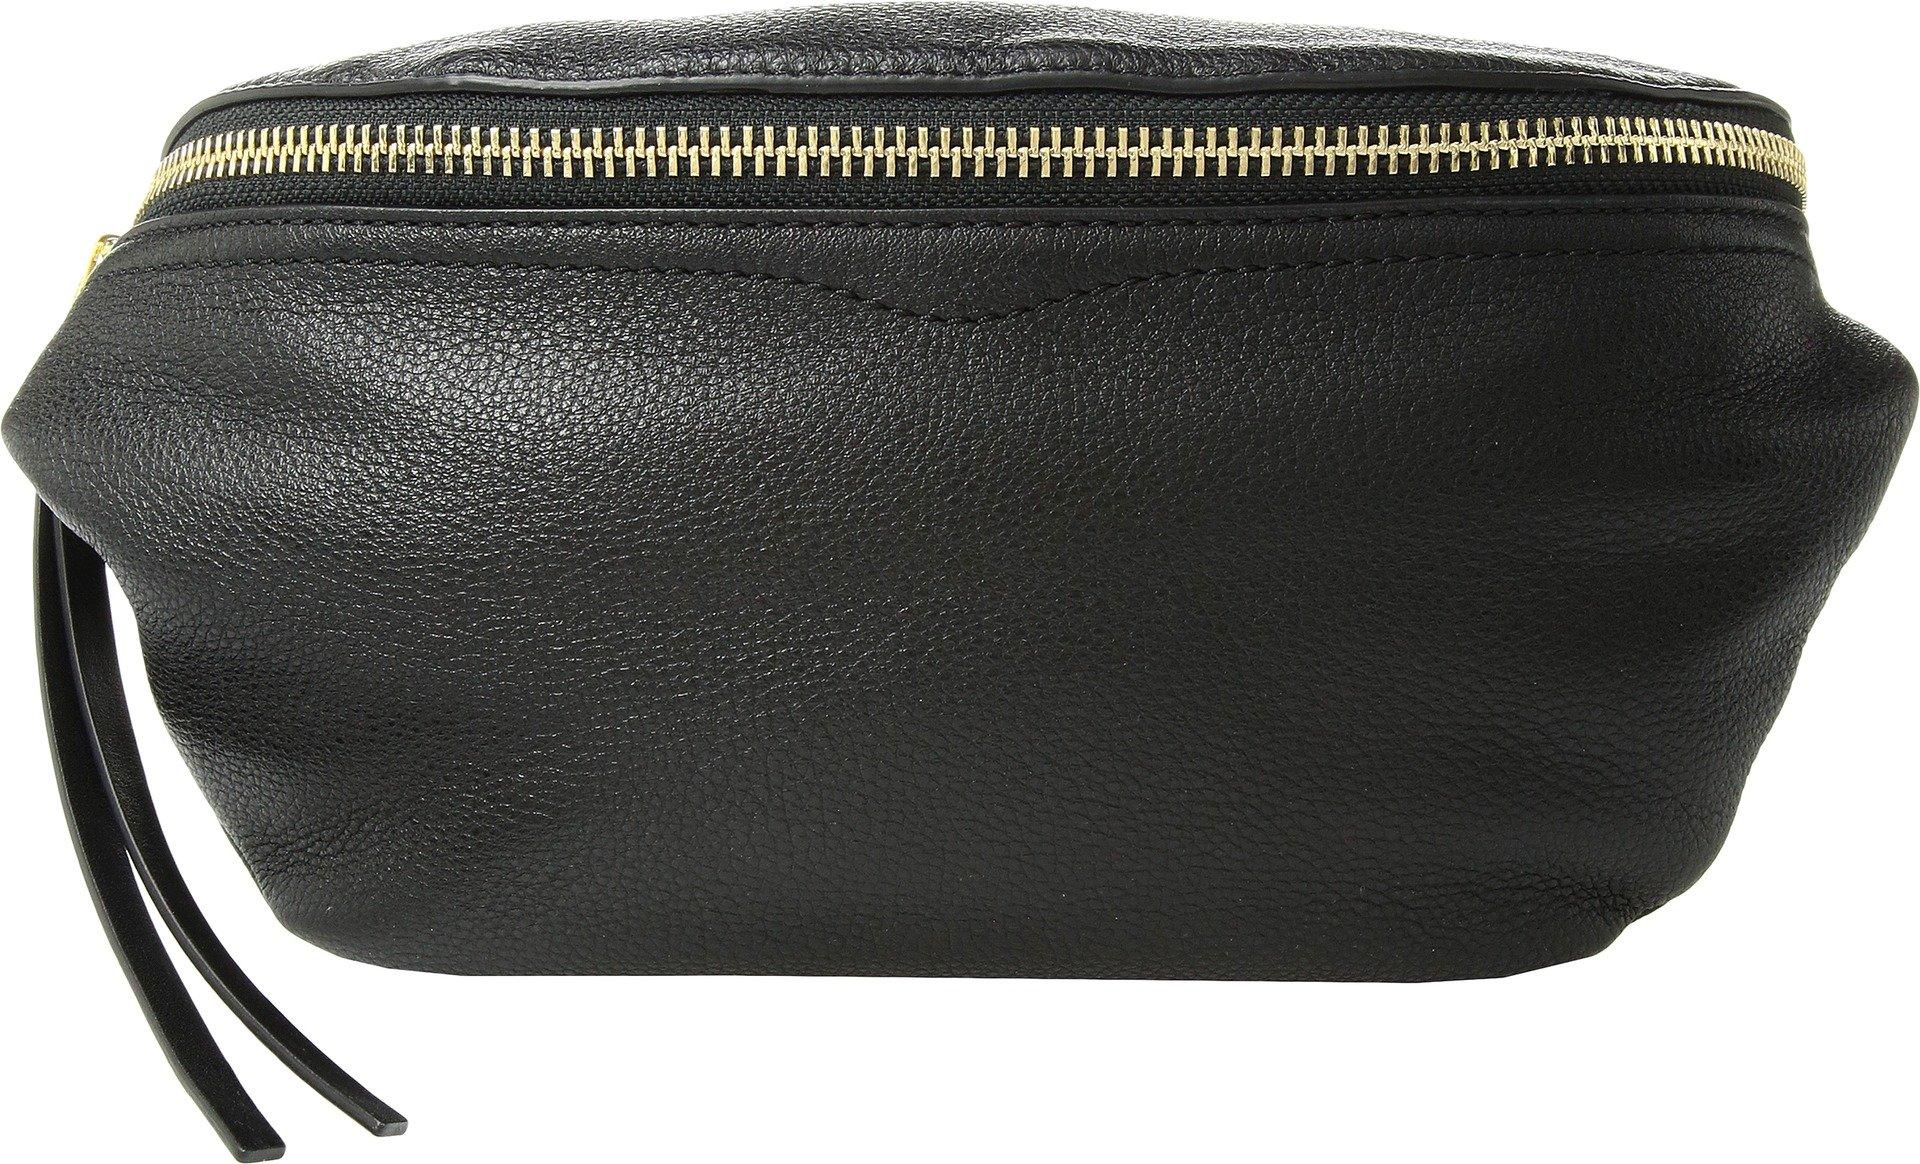 Rebecca Minkoff Women's Bree Belt Bag, Black, One Size